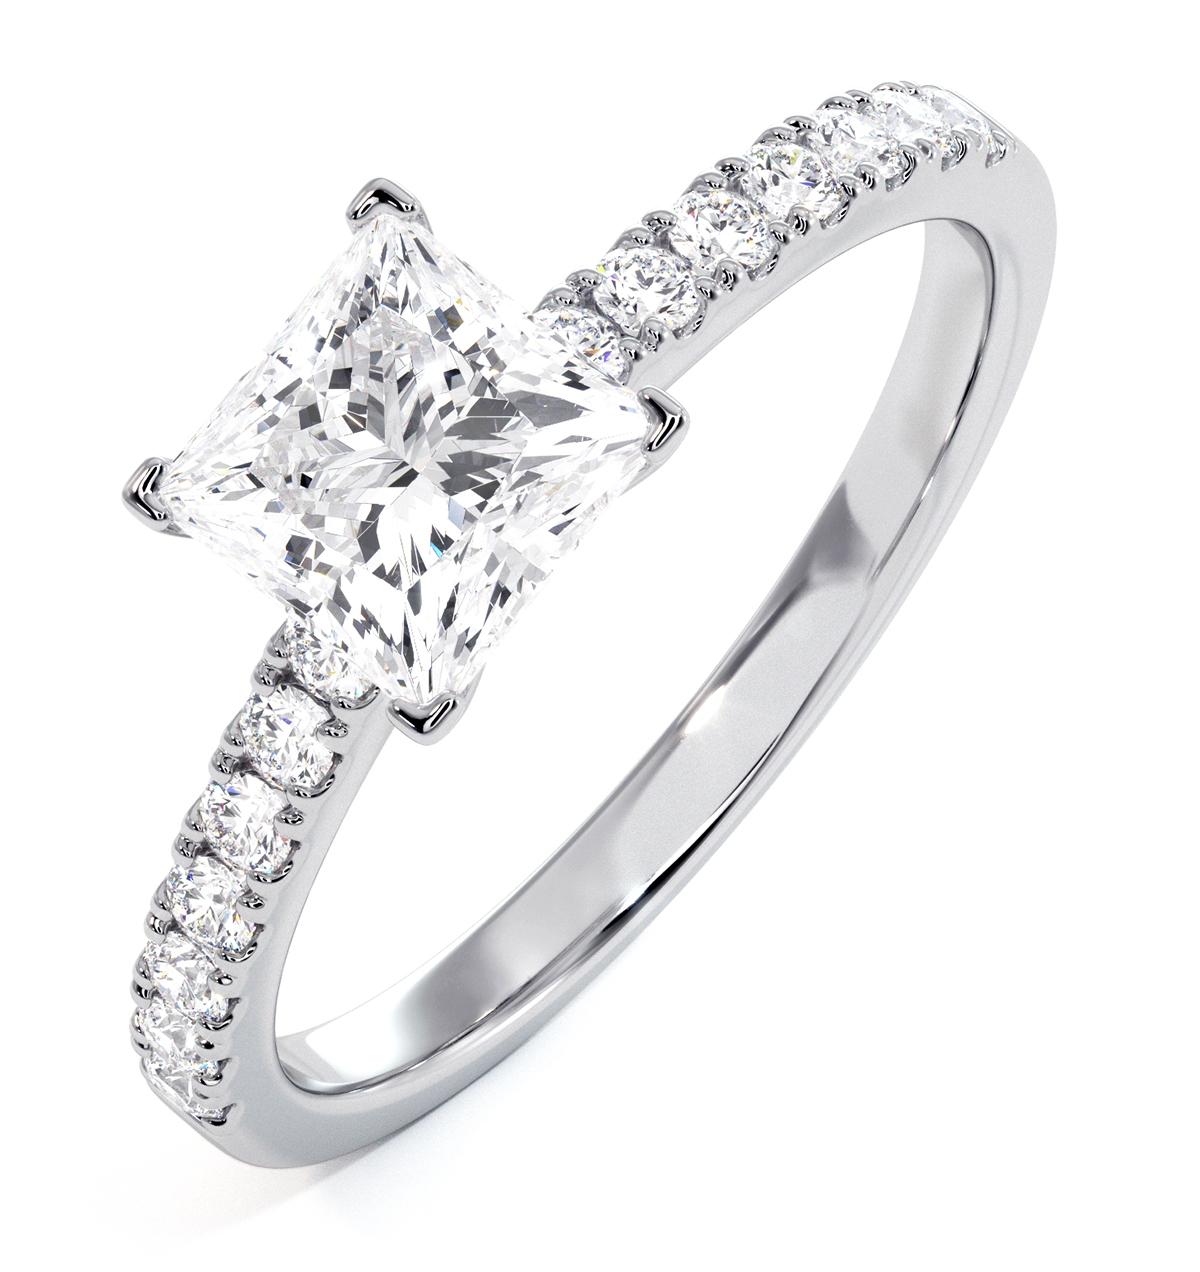 Katerina GIA Princess Diamond Engagement Ring 18KW Gold 1.50ct G/SI1 - image 1